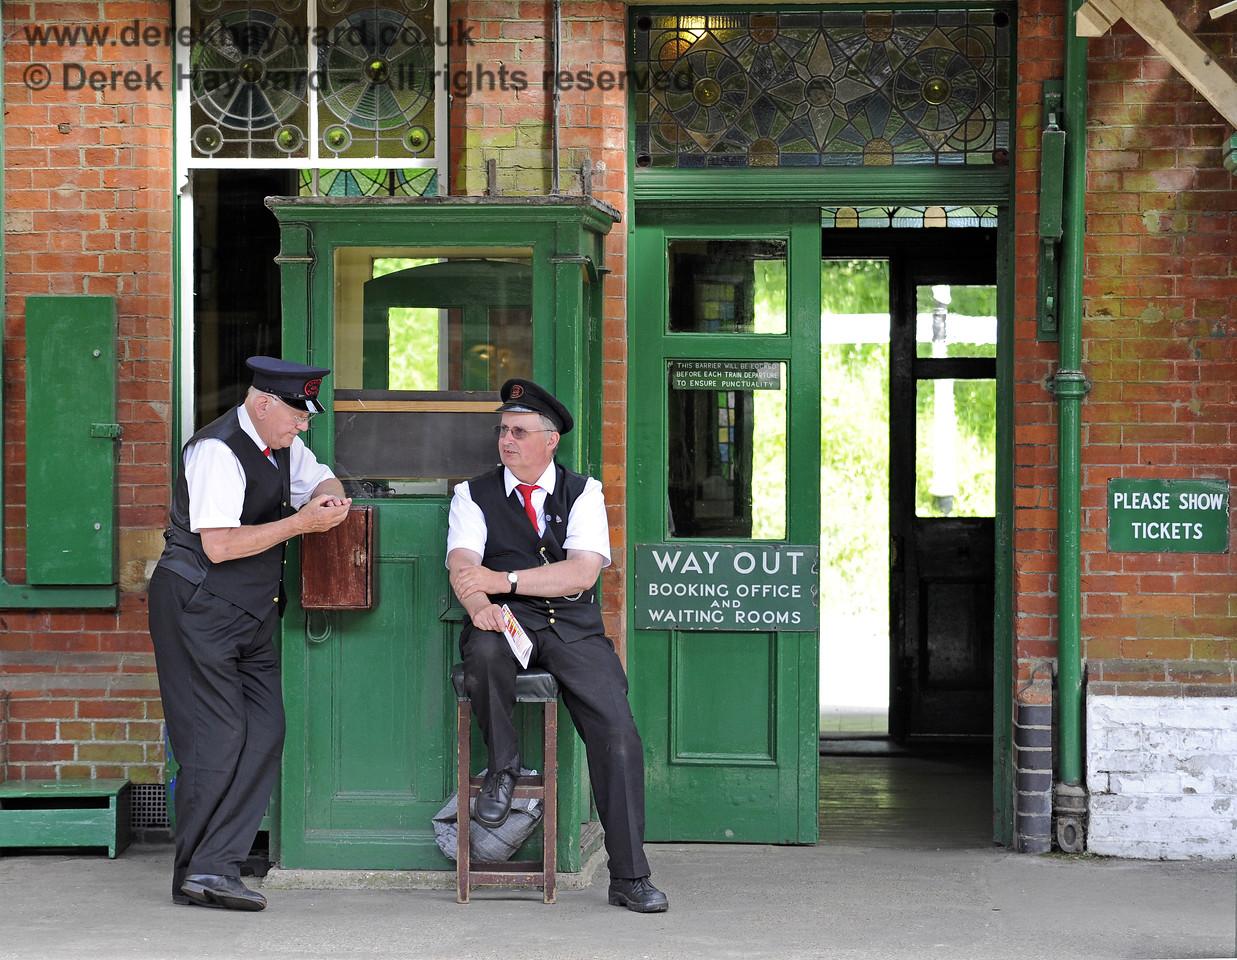 Station staff on duty at Horsted Keynes. 08.06.2014  9562